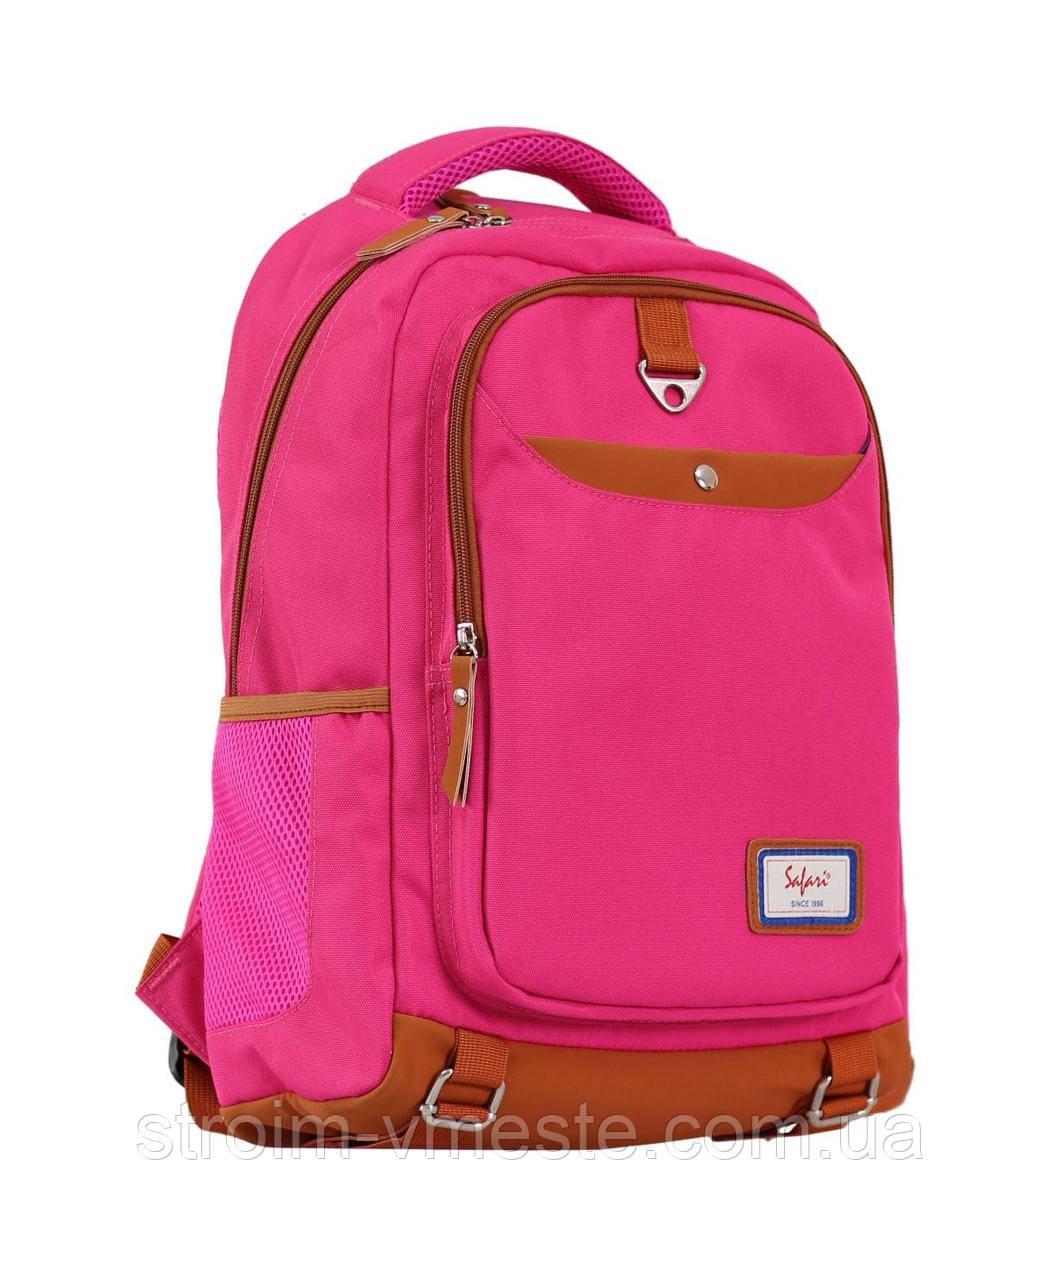 Рюкзак 3 отд 45*30*19 см 900D PL SAFARI Trend 1838